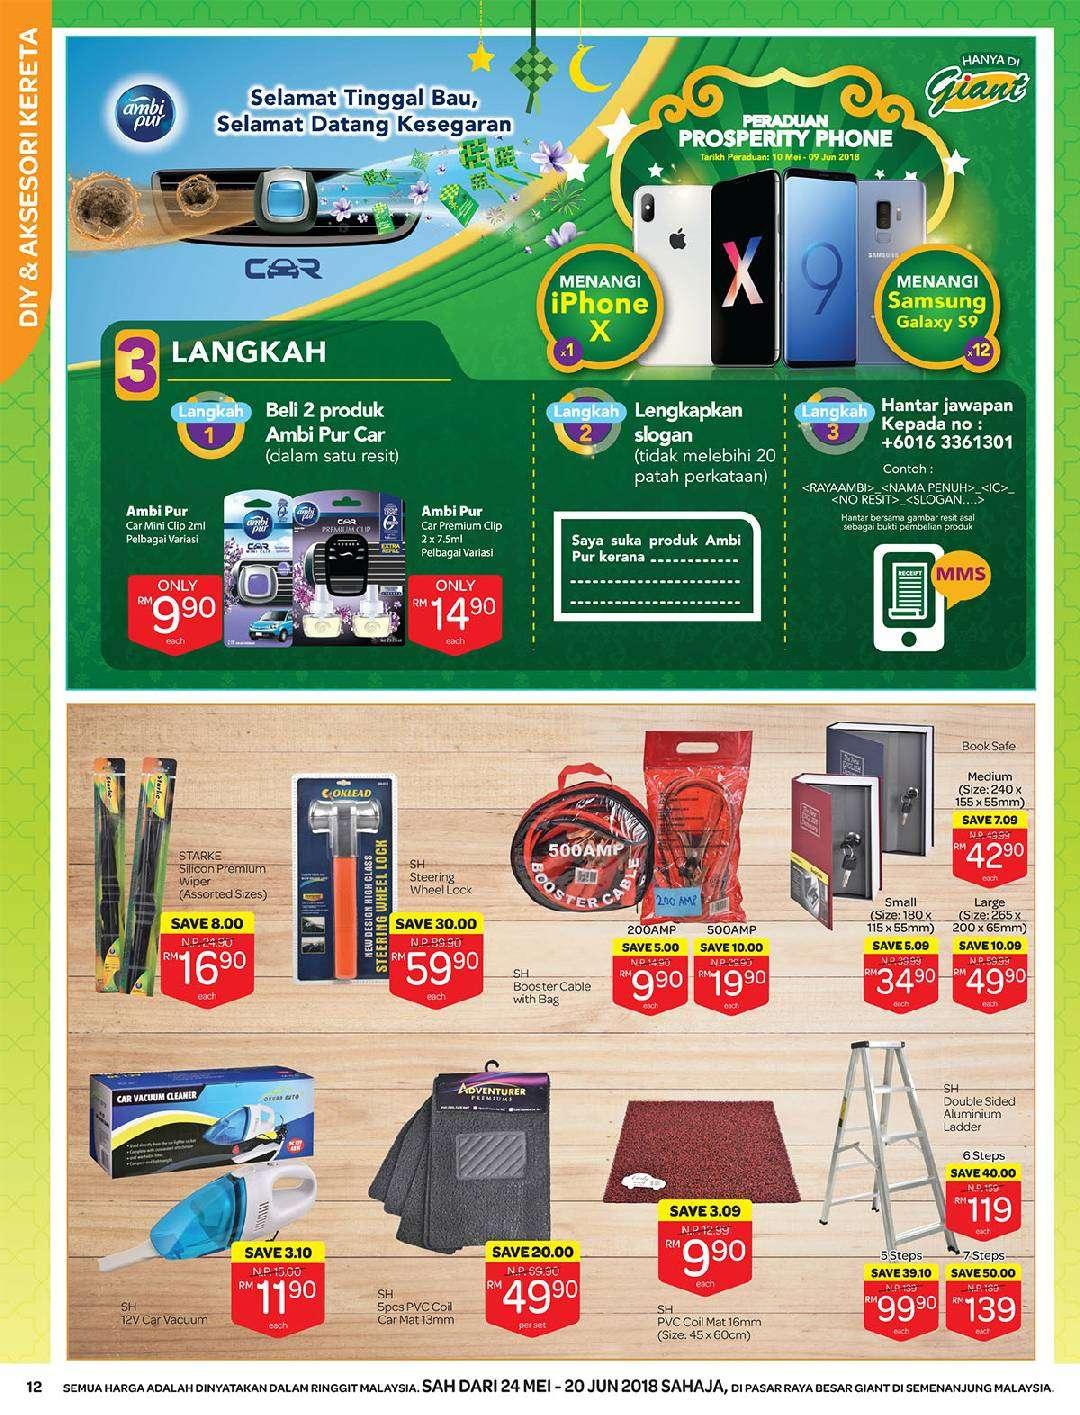 Giant Catalogue (24 May 2018 - 20 June 2018)